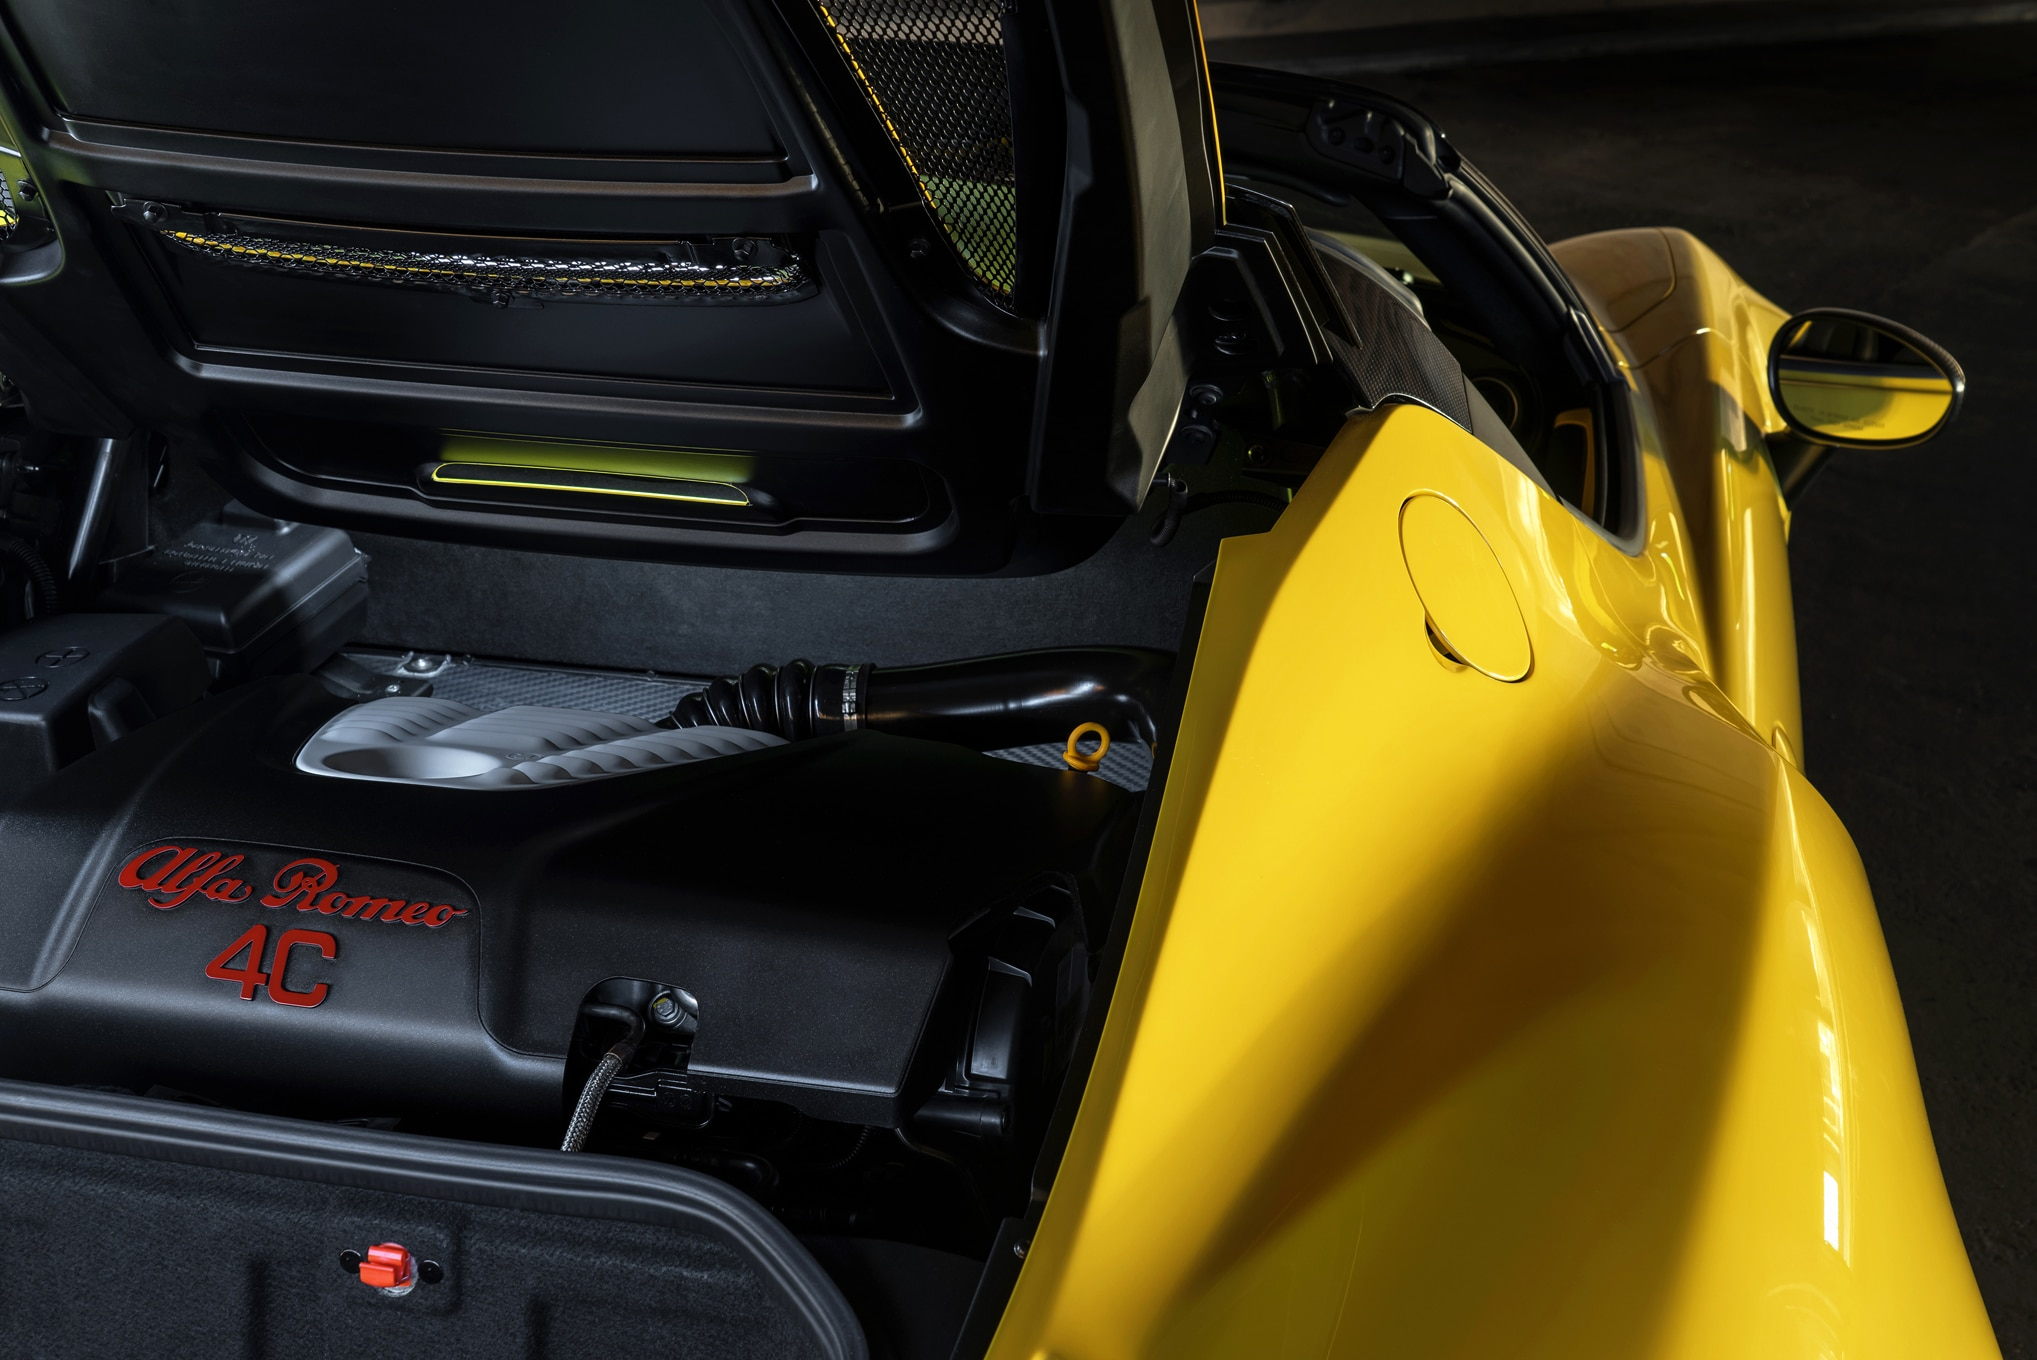 Alfa Romeo 4c Exhaust >> 2016 Alfa Romeo 4C Gets More Carbon Fiber, Optional Akrapovic Exhaust